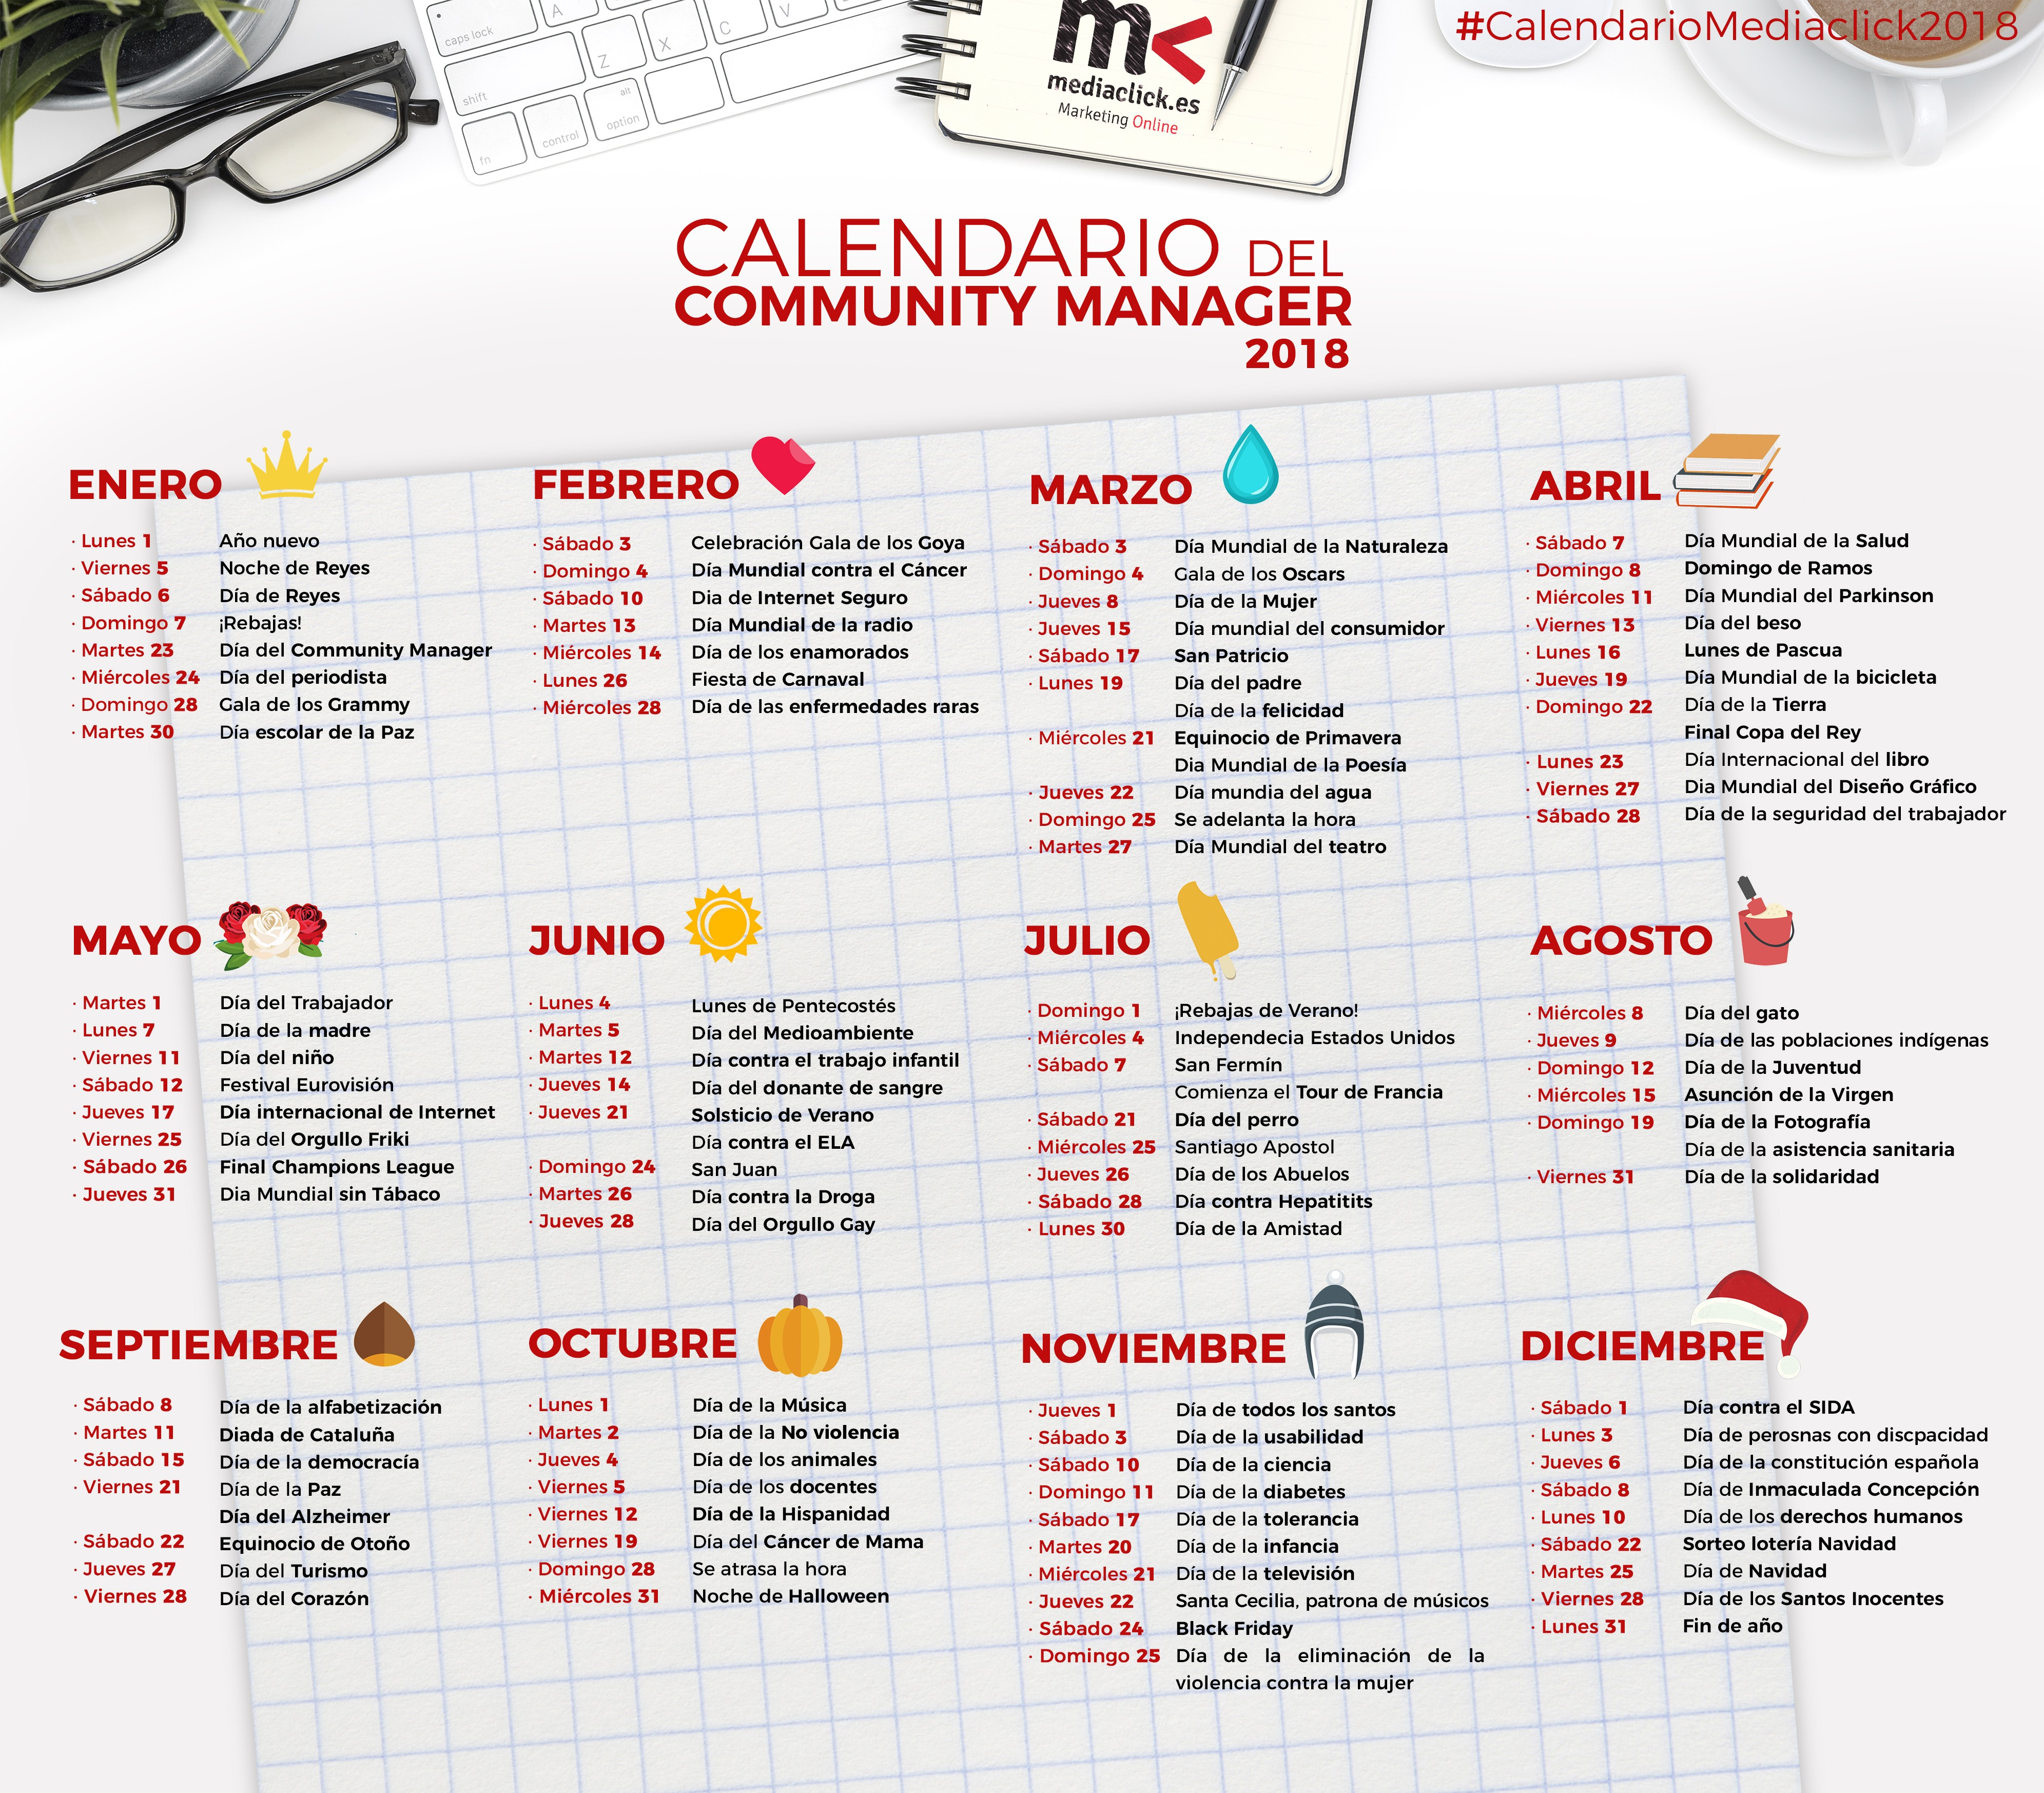 Calendario del munity Manager 2018